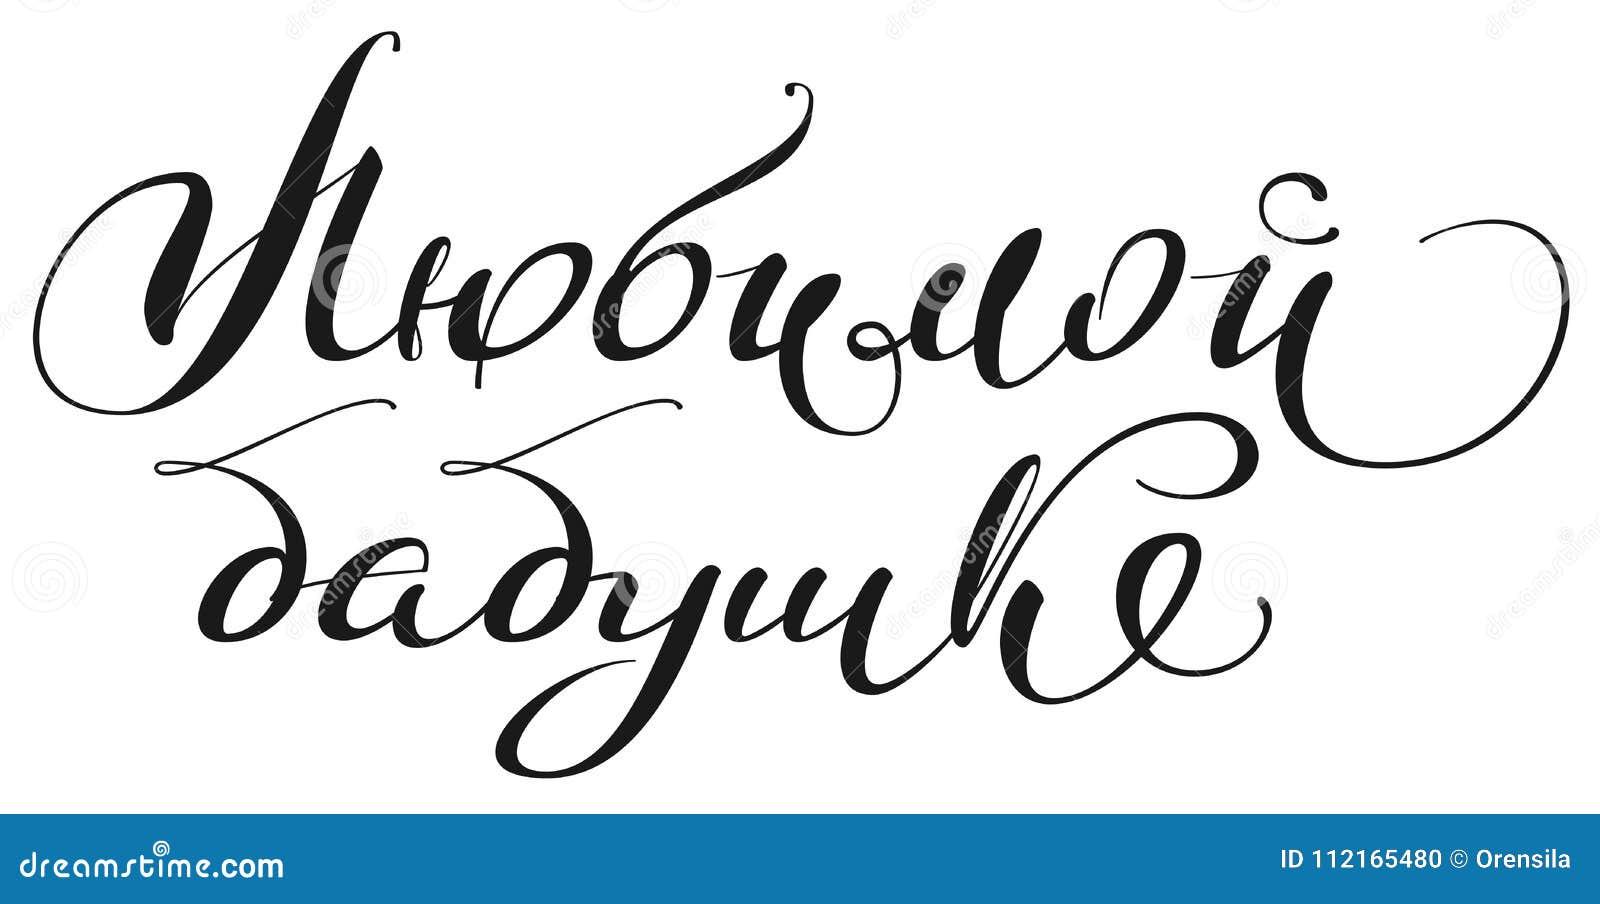 5ec01fe48616 Στην αγαπημένη μετάφραση γιαγιάδων από τα ρωσικά Κείμενο καλλιγραφίας γραφής